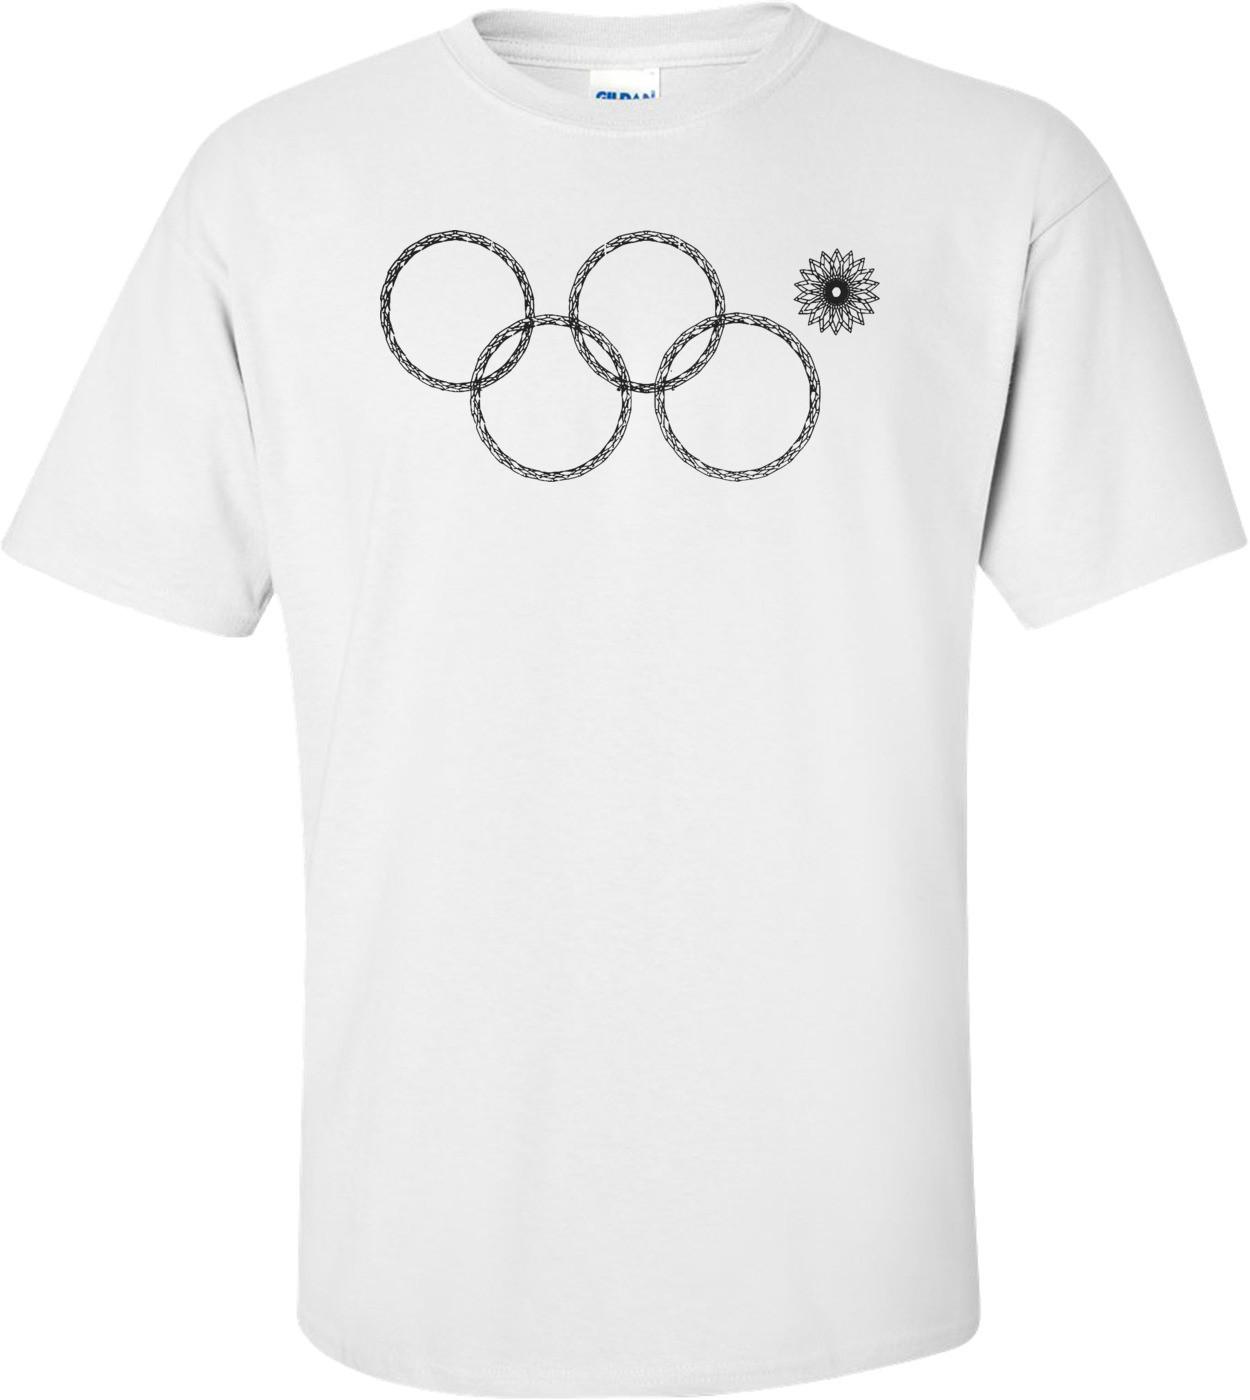 Sochi Olympic Ring Fail Funny Shirt